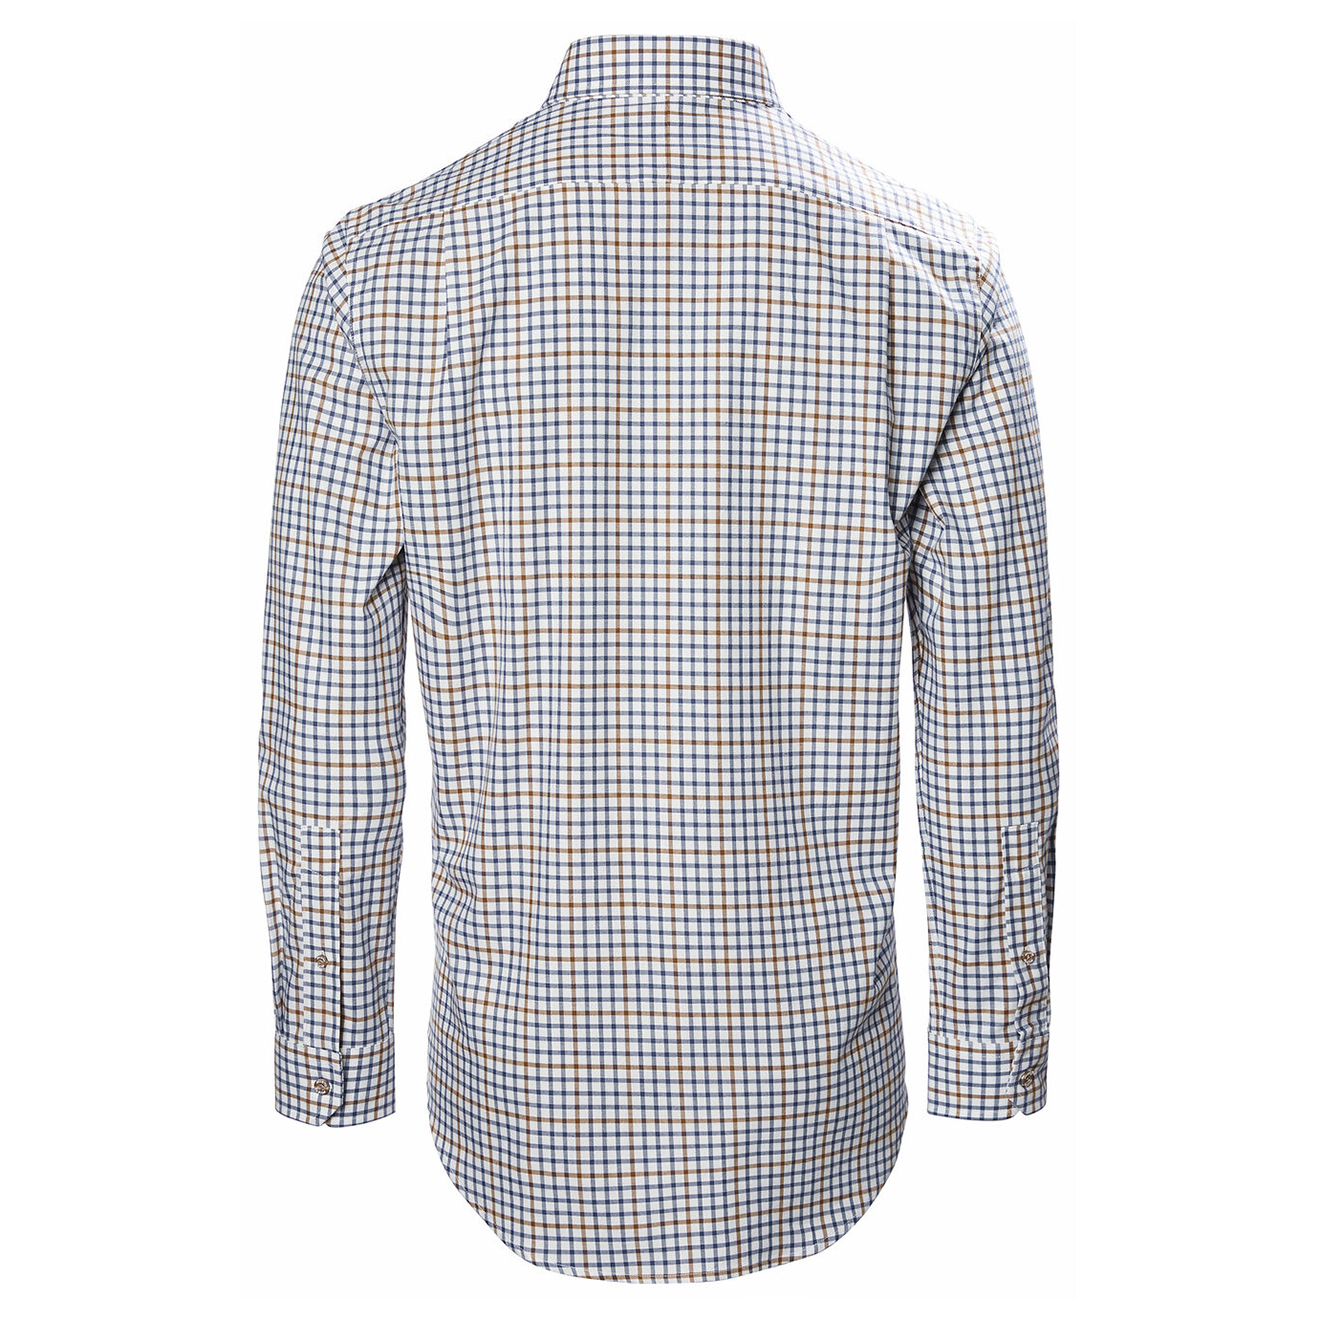 Musto Classic Button Down Shirt Keldy Blue JANUARY SALE!